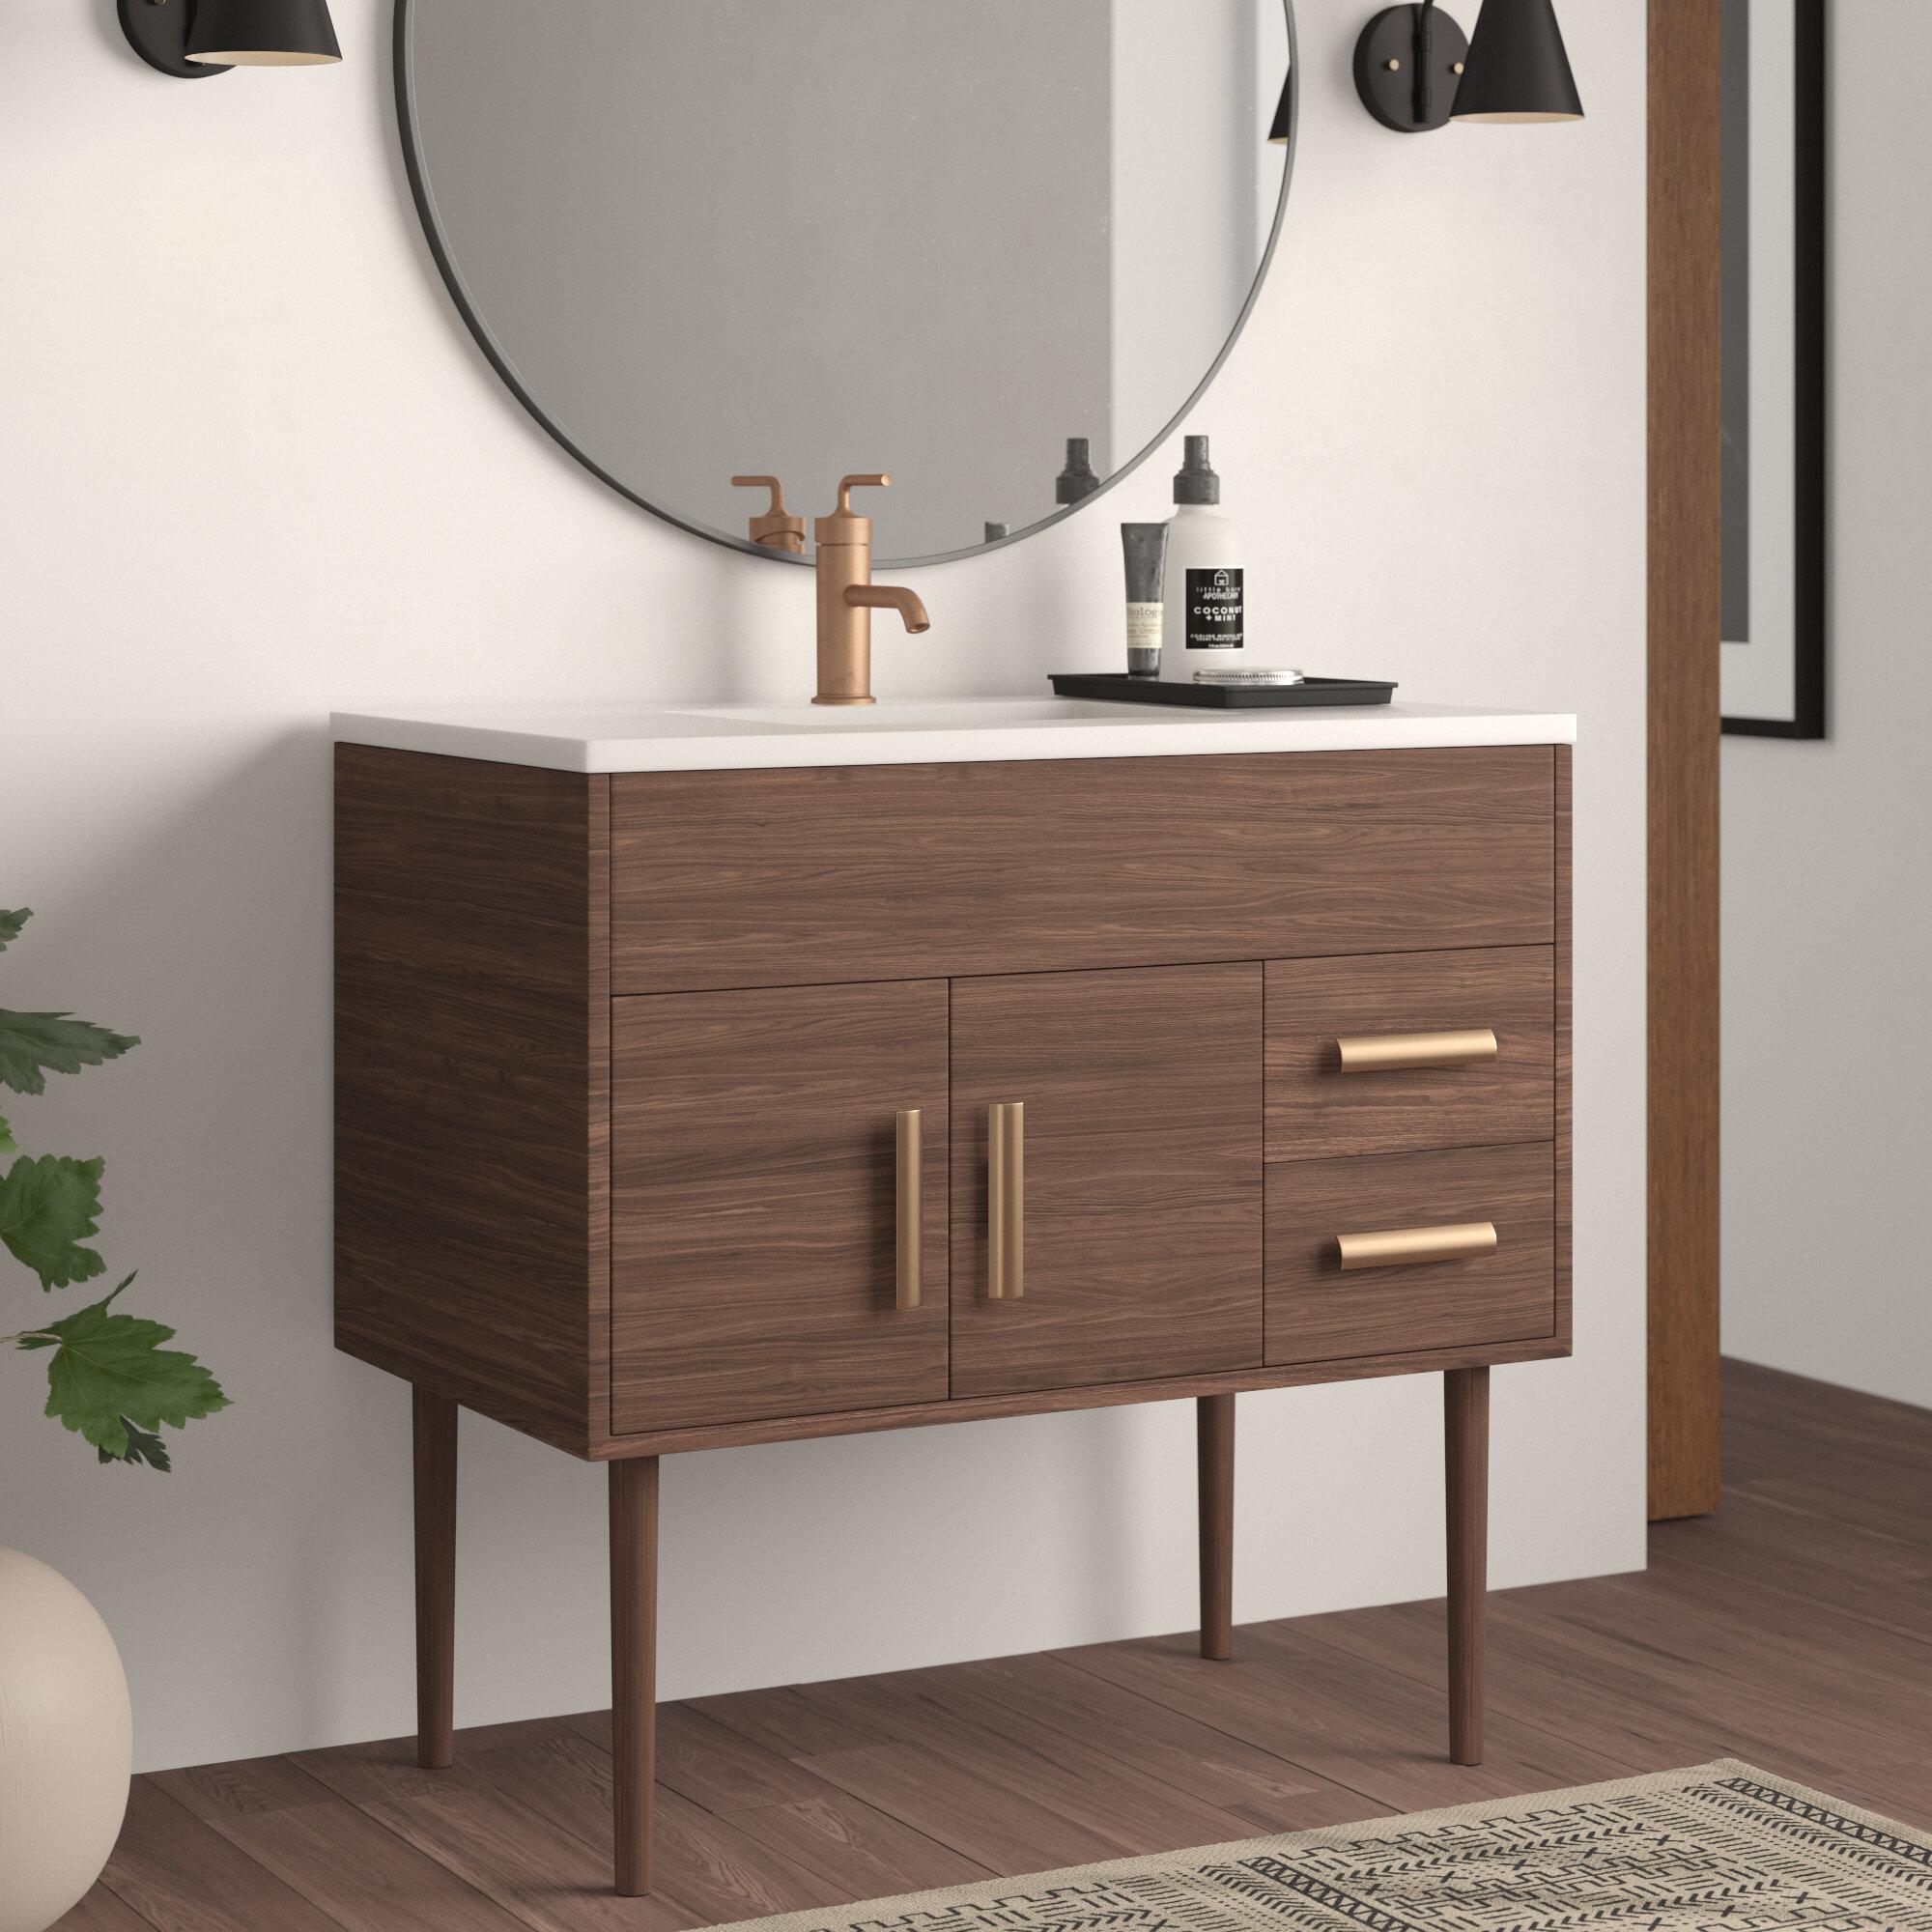 Matthews 37 Single Bathroom Vanity Set Reviews Allmodern